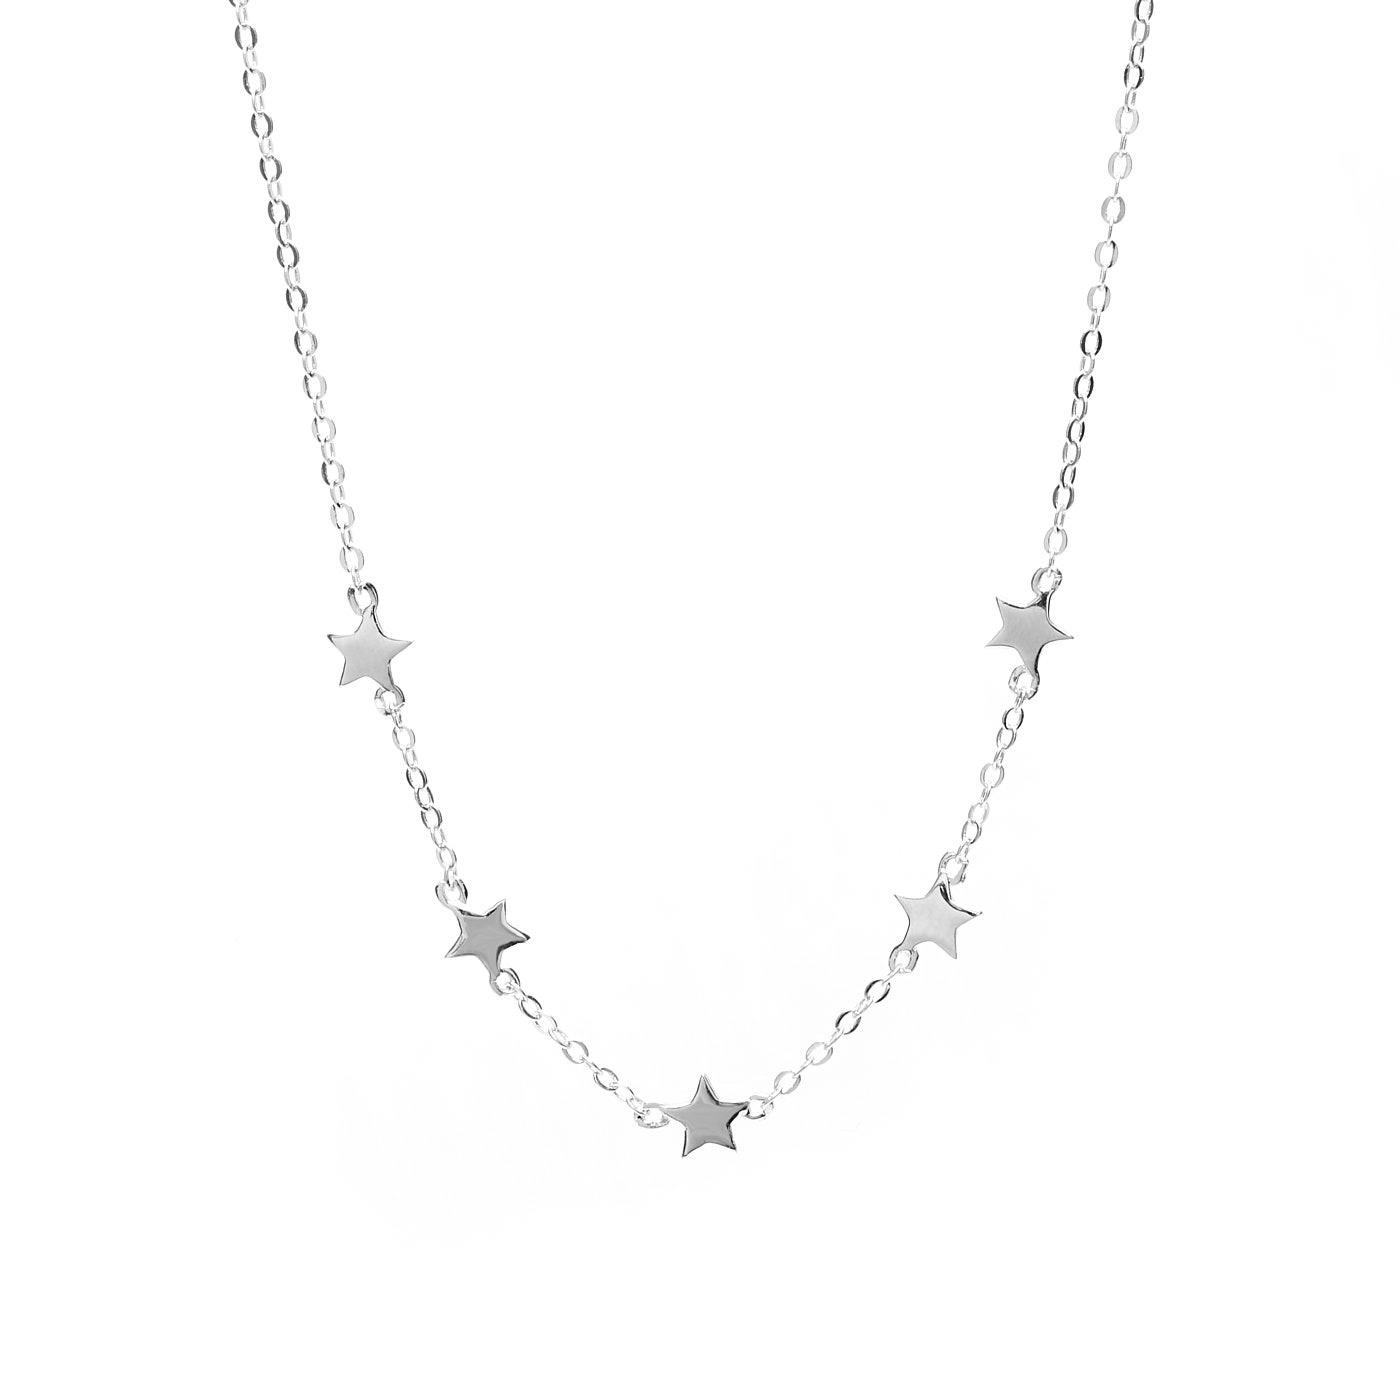 Violet Hamden silver necklace worth €59,95